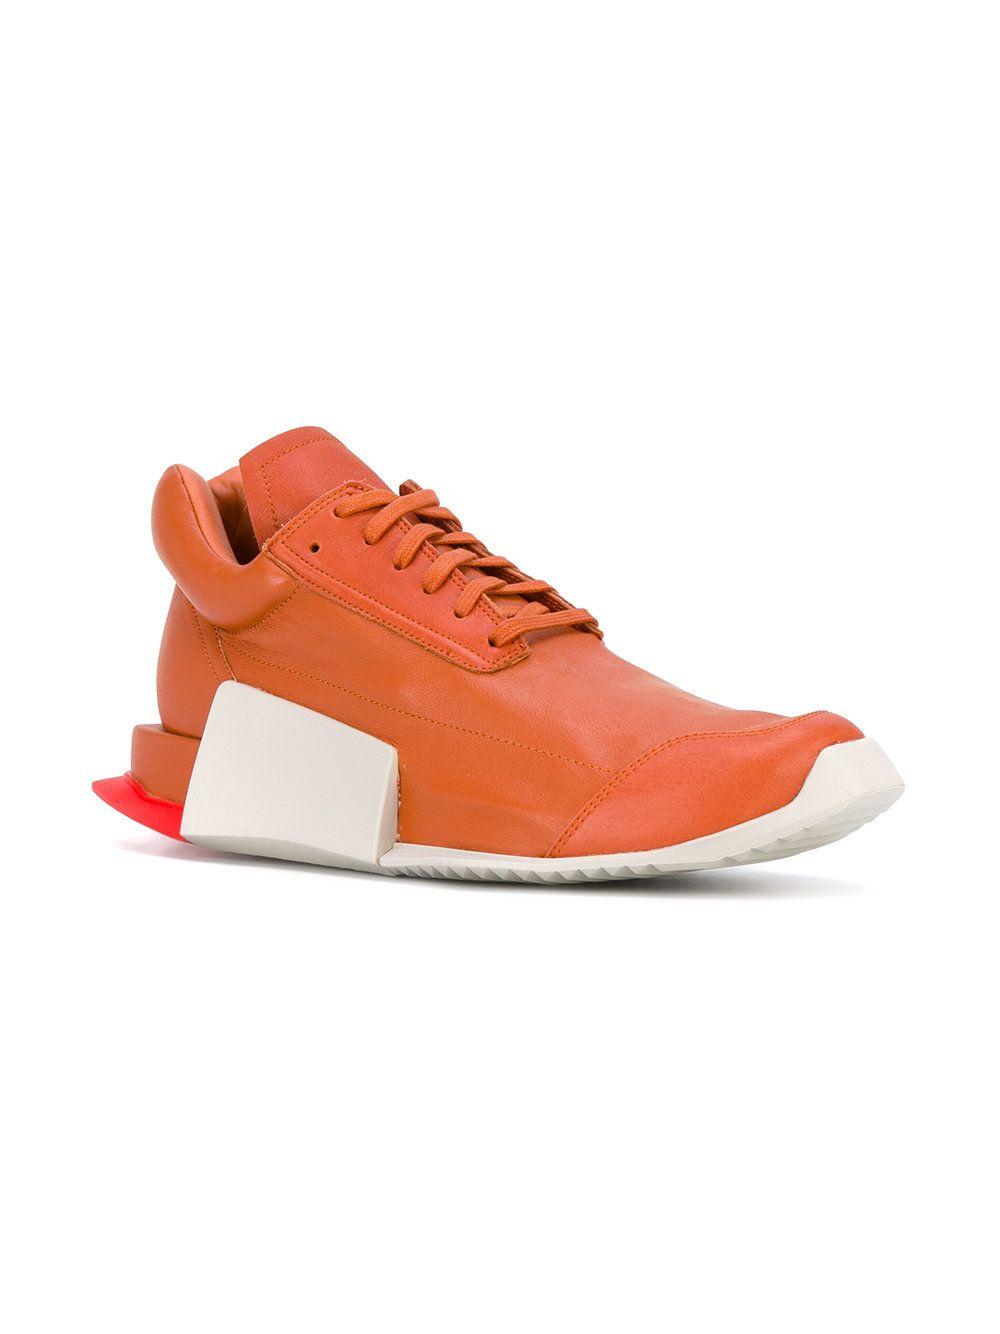 4d316cccf1b791 Rick Owens Rick Owens x Adidas Level Runner sneakers